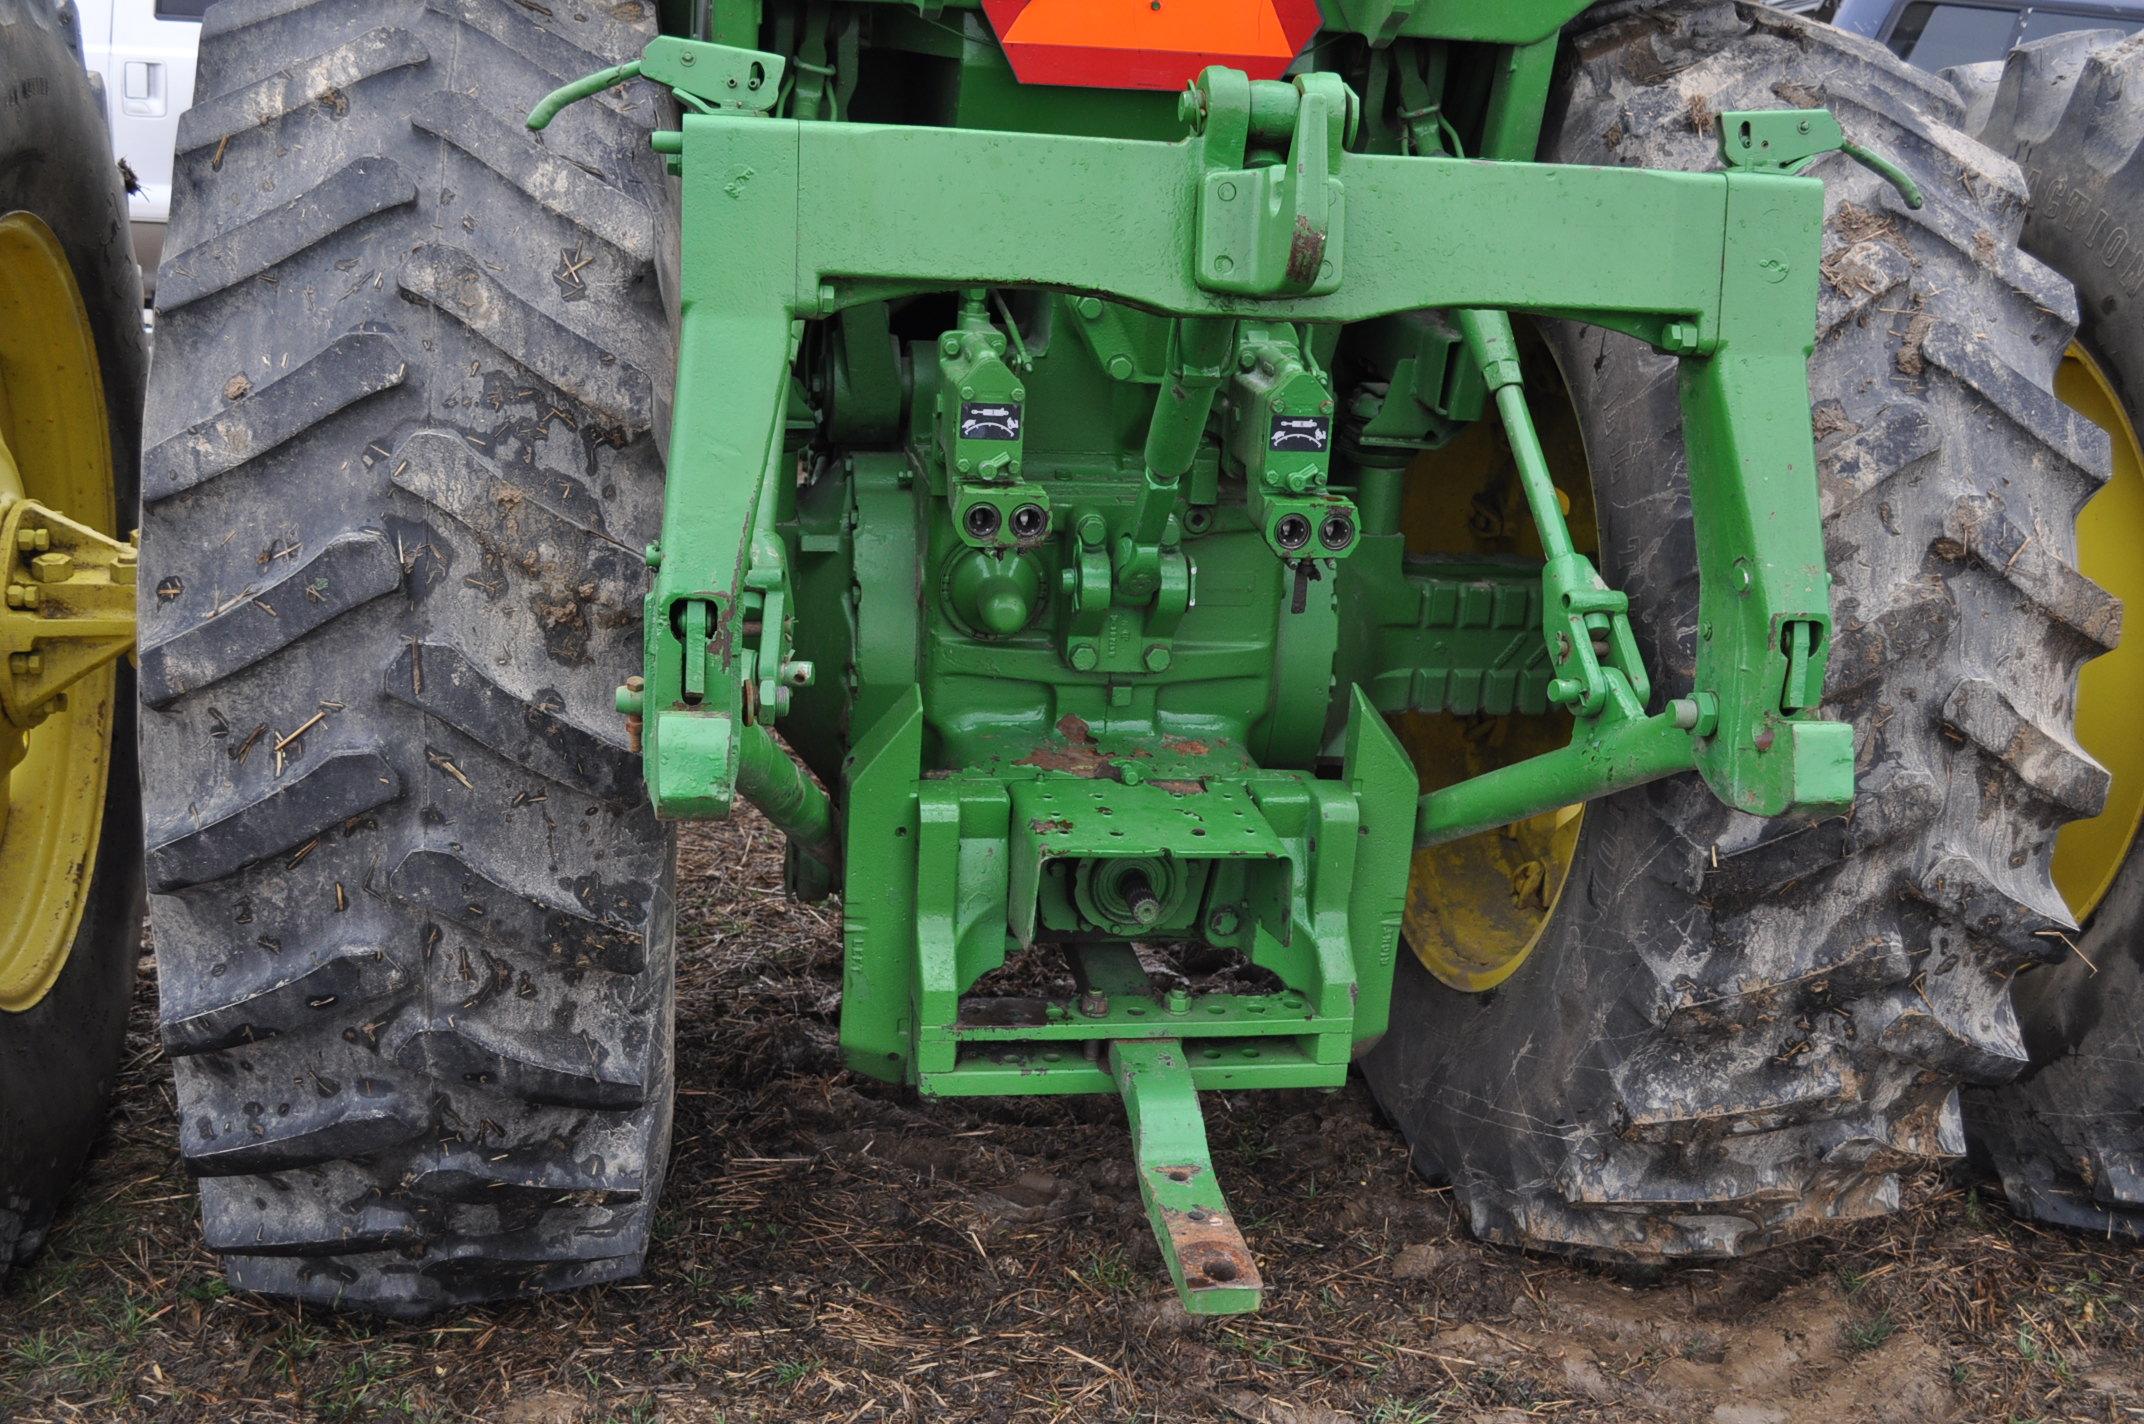 John Deere 4630 tractor, diesel, 20.8-38 hub duals, 14L-16 front, CHA, Quad range, 2 hyd remotes, - Image 11 of 22